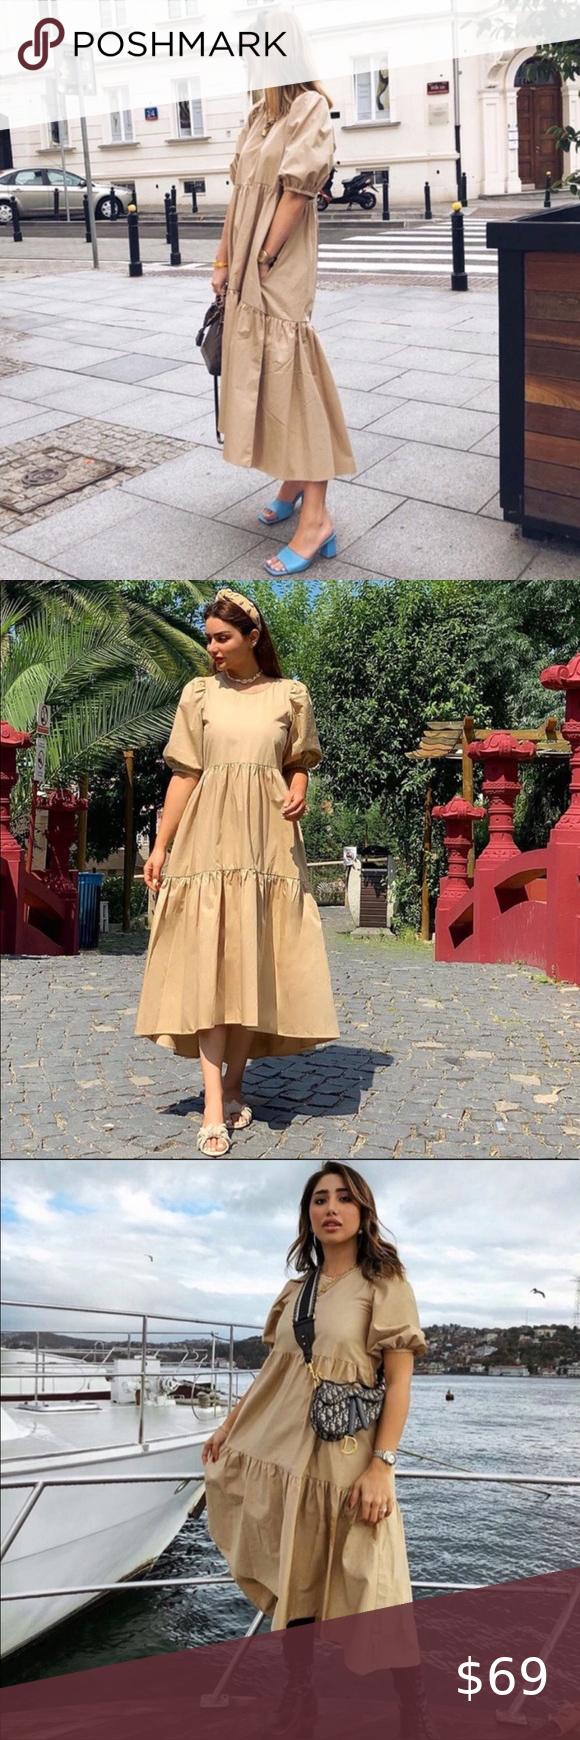 Zara puff sleeve poplin dress   Poplin dress, Dresses, Zara dresses